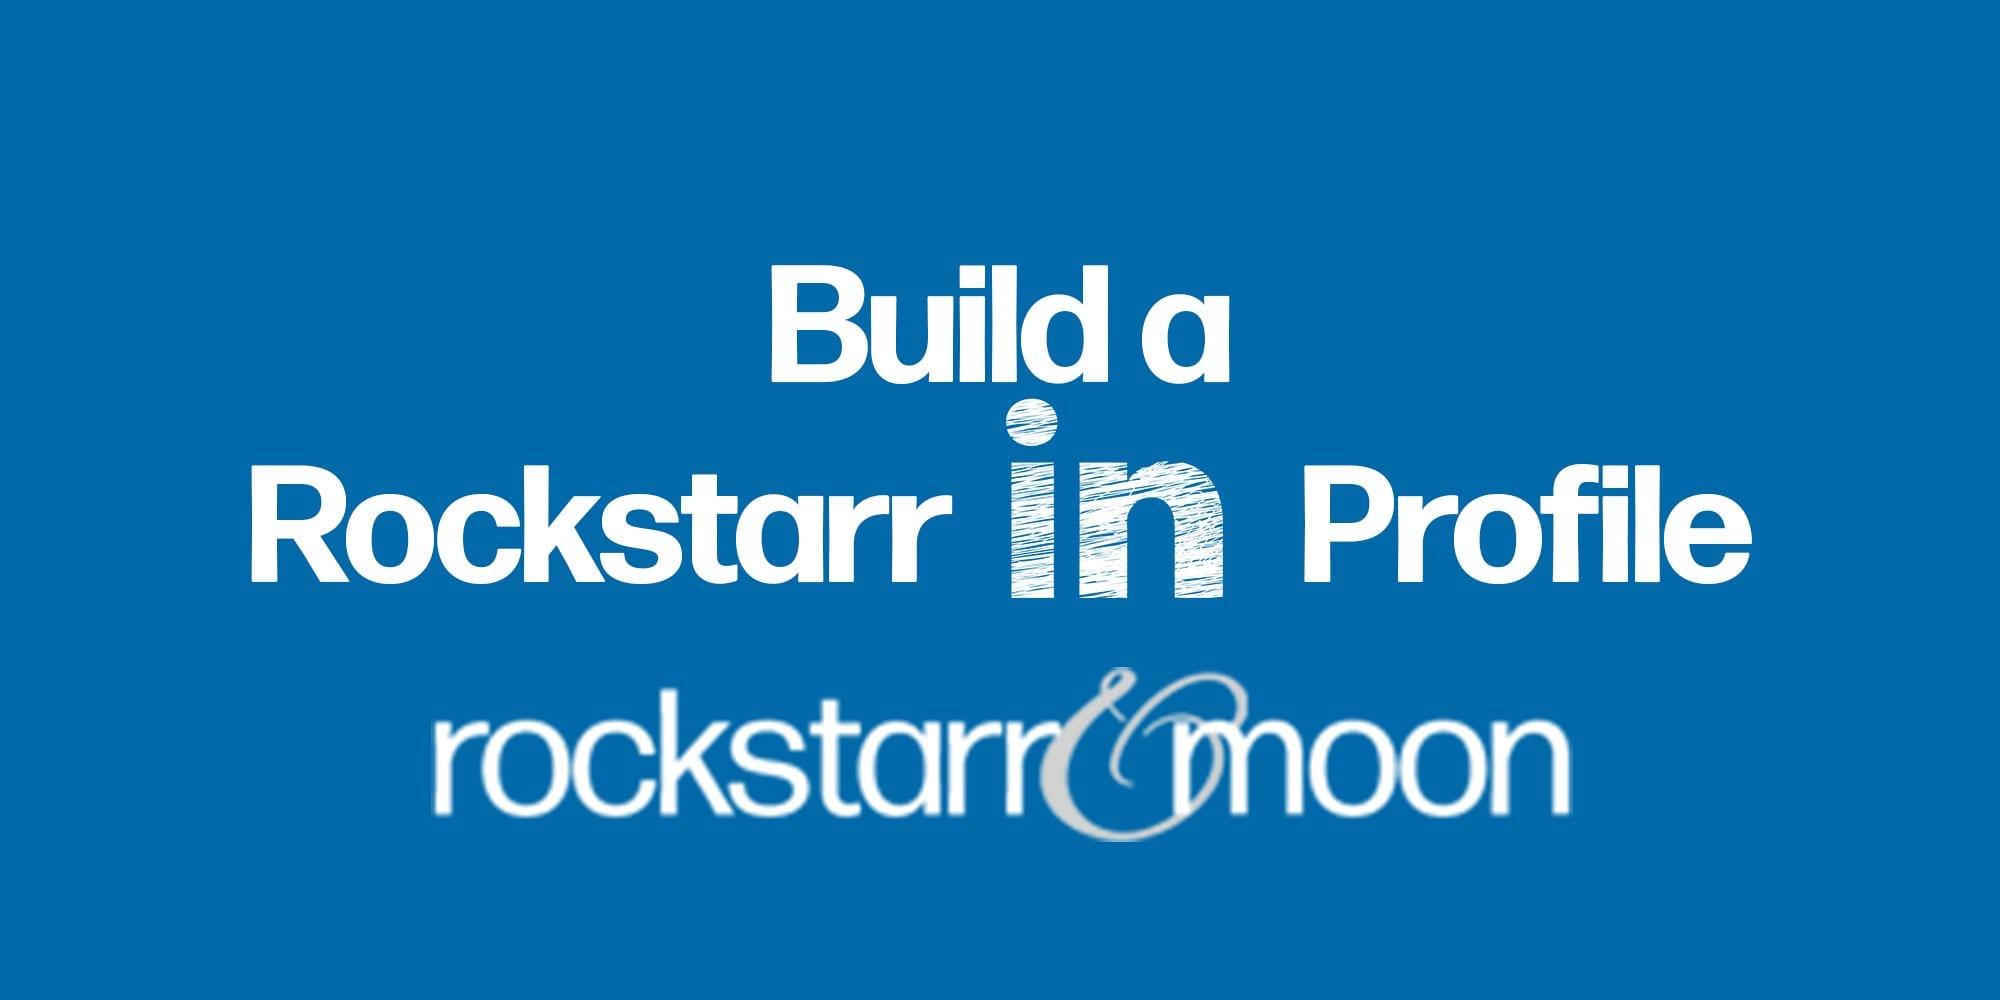 Build a Rockstarr LinkedIn Profile